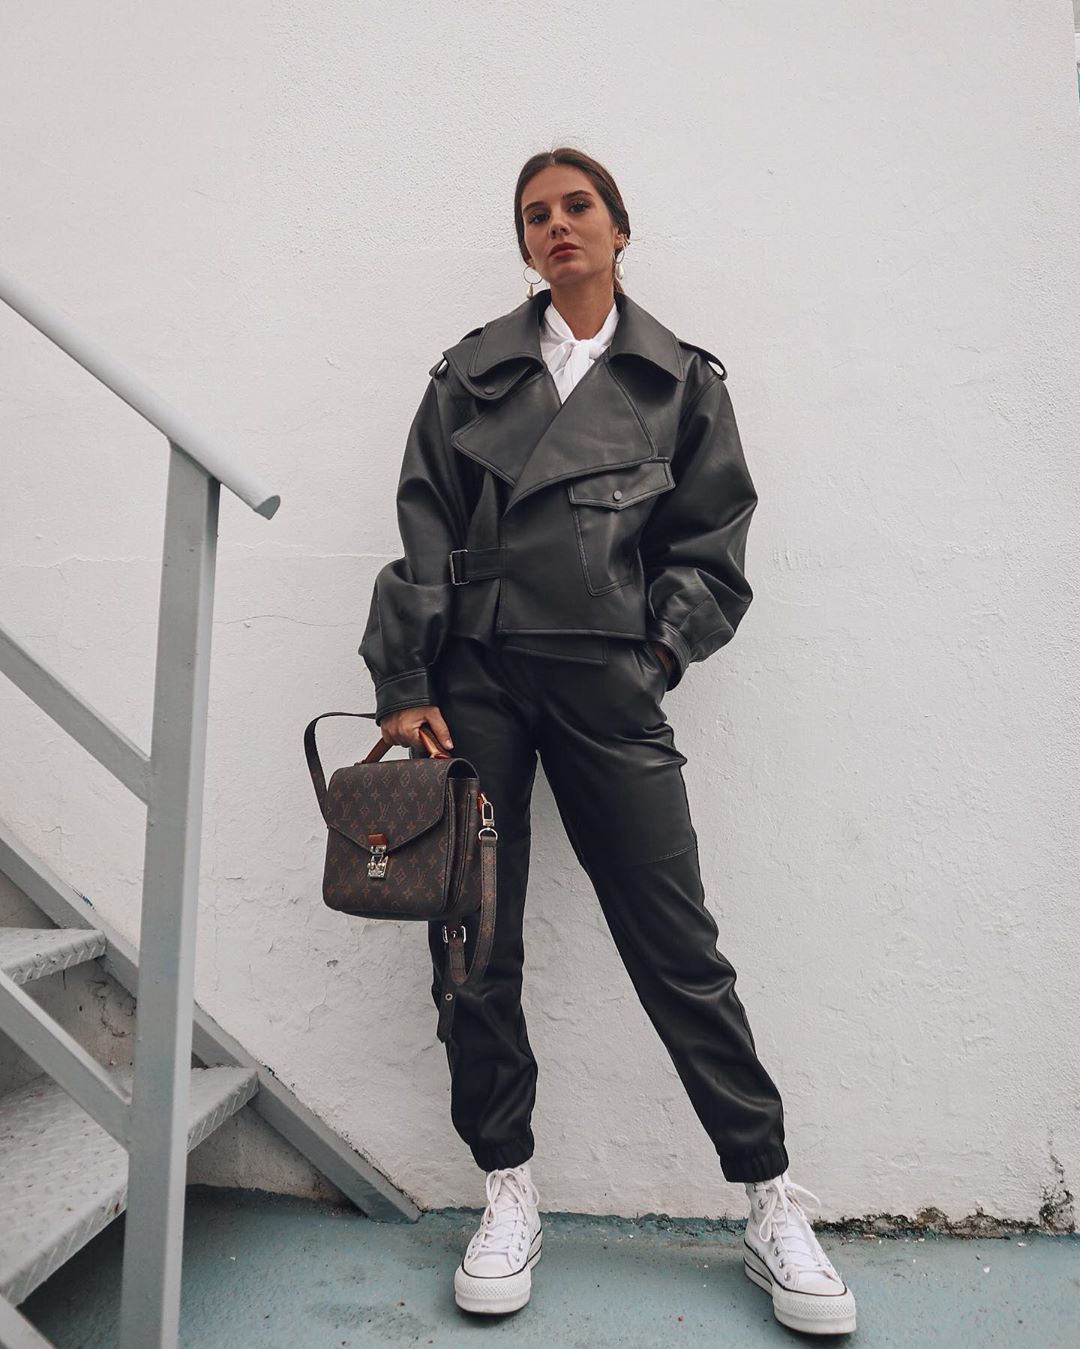 faux leather jogger pants de Bershka sur marinamcerezo